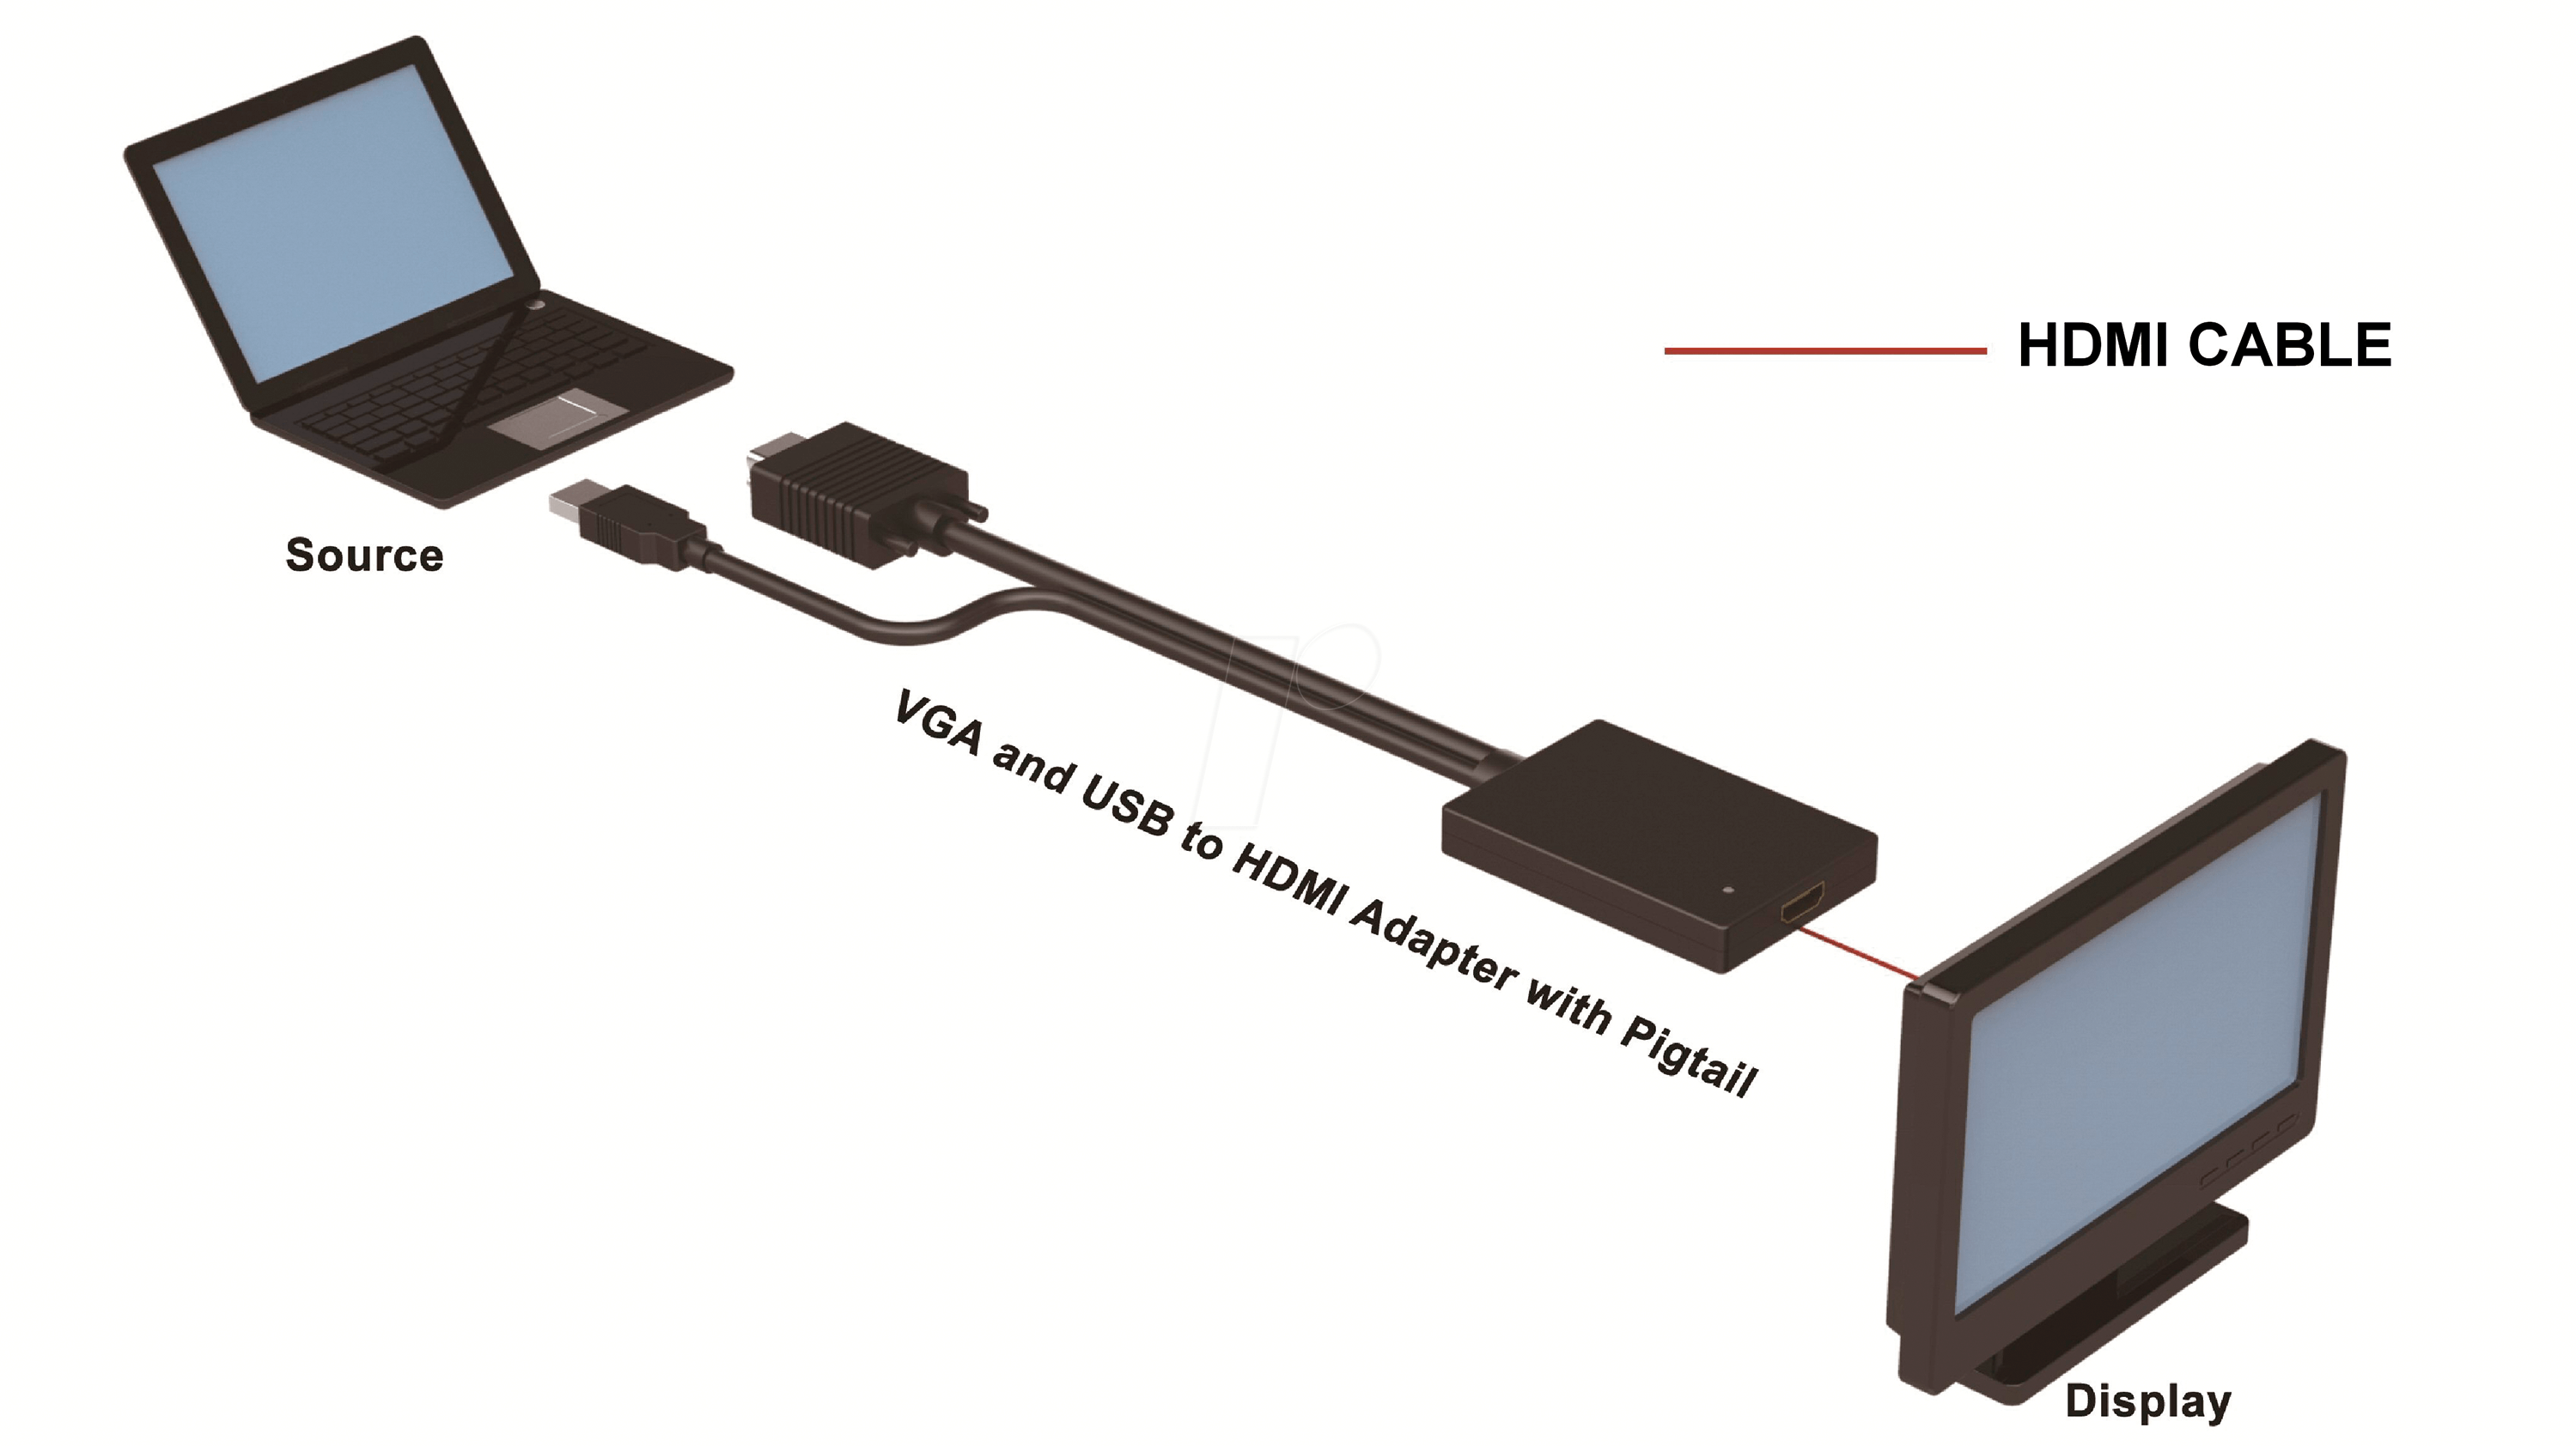 https://cdn-reichelt.de/bilder/web/xxl_ws/I900/IDATA-HDMI-VGA3_02_ANW.png